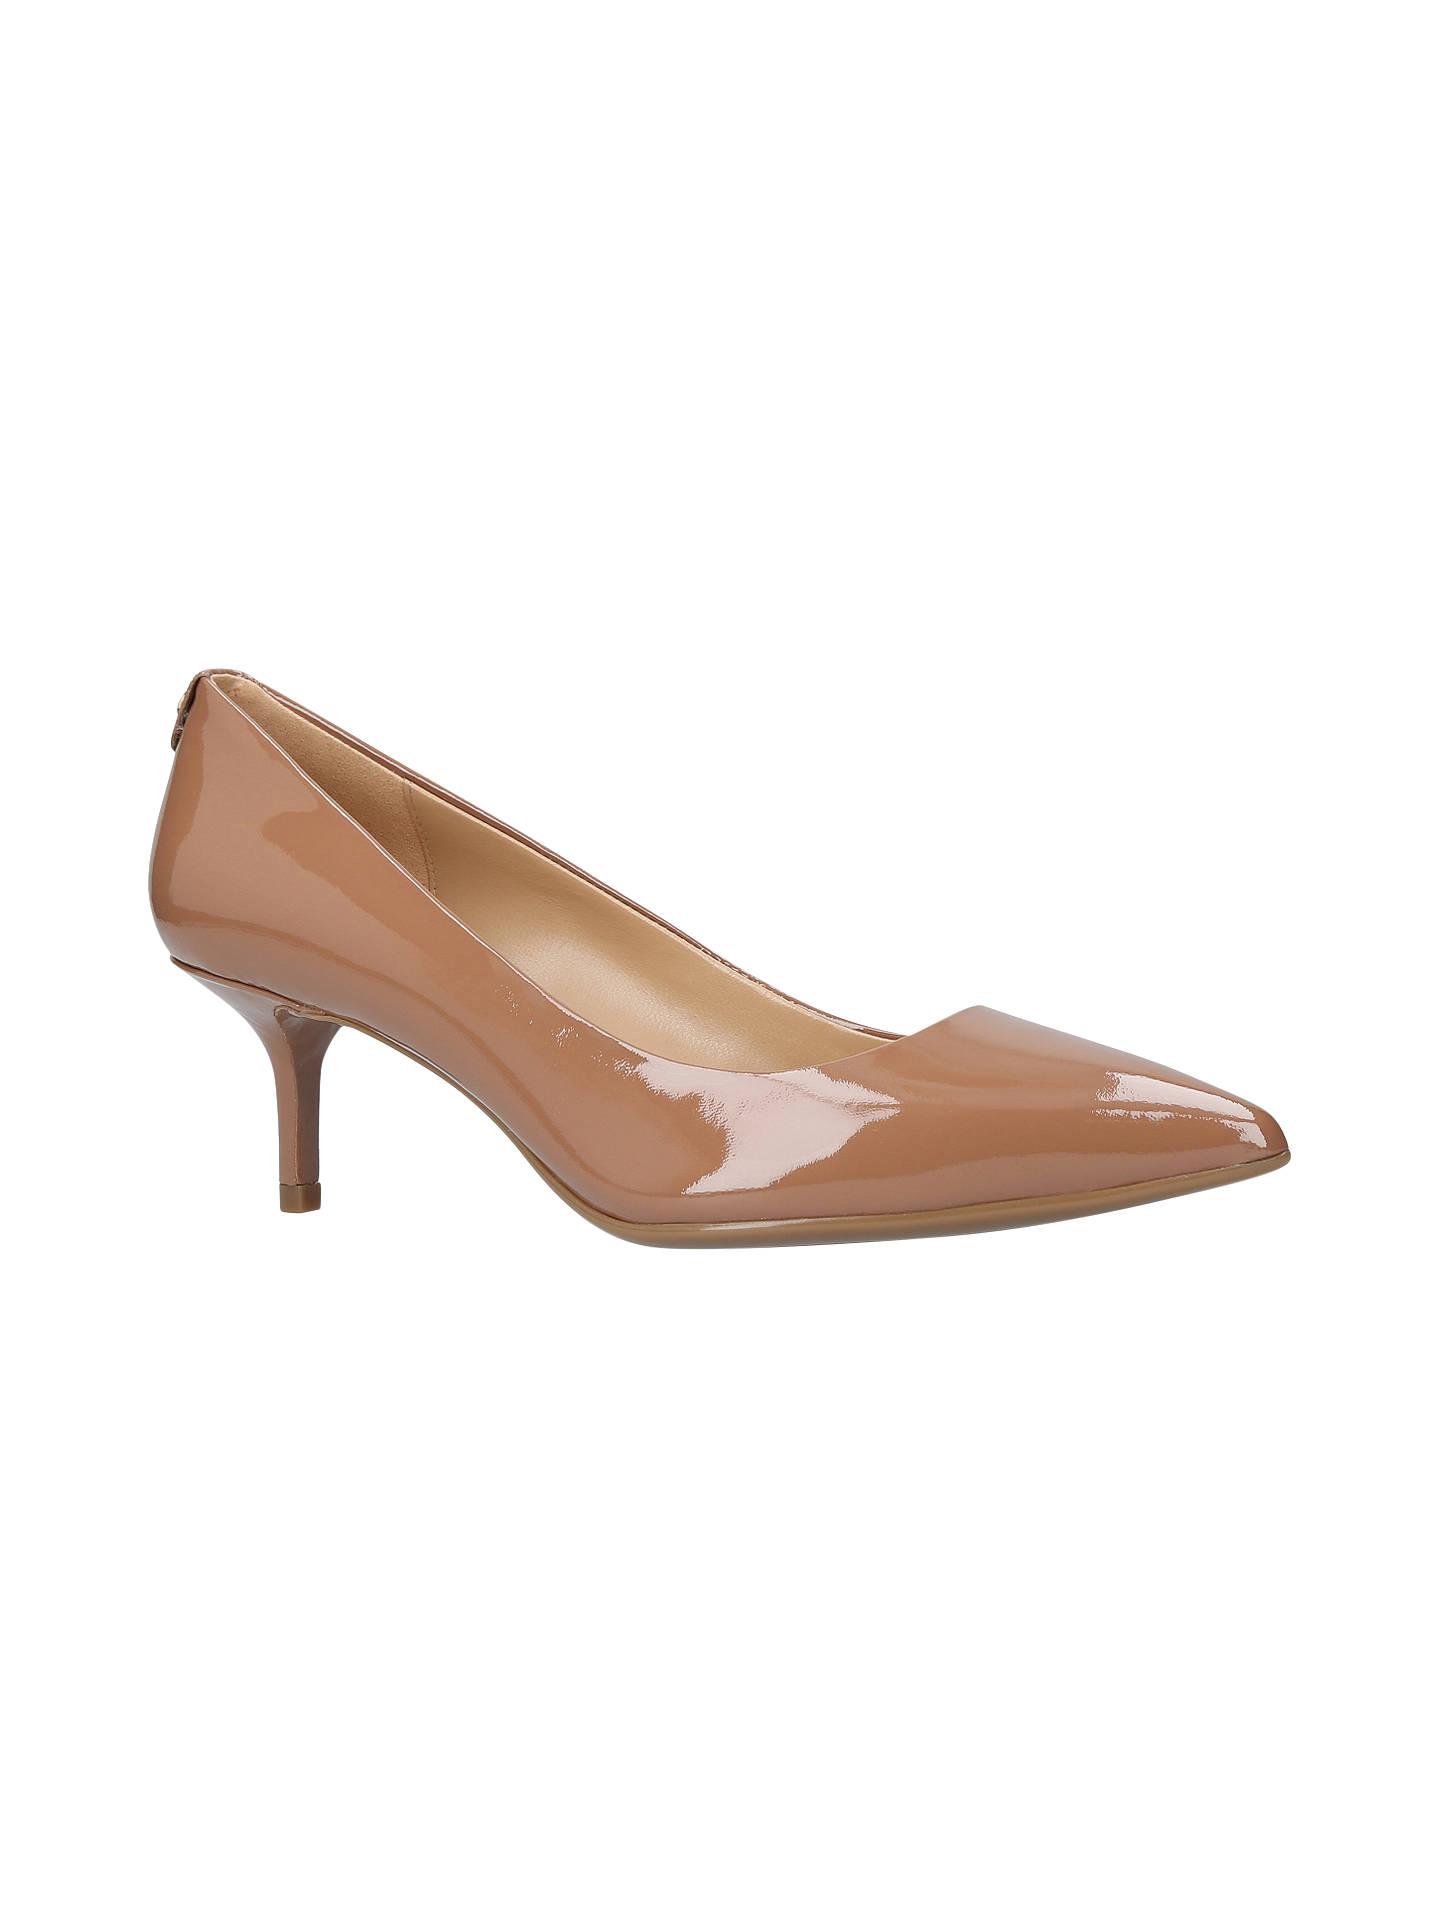 2343abc63b5 MICHAEL Michael Kors Flex Pump Kitten Heel Court Shoes at John Lewis ...